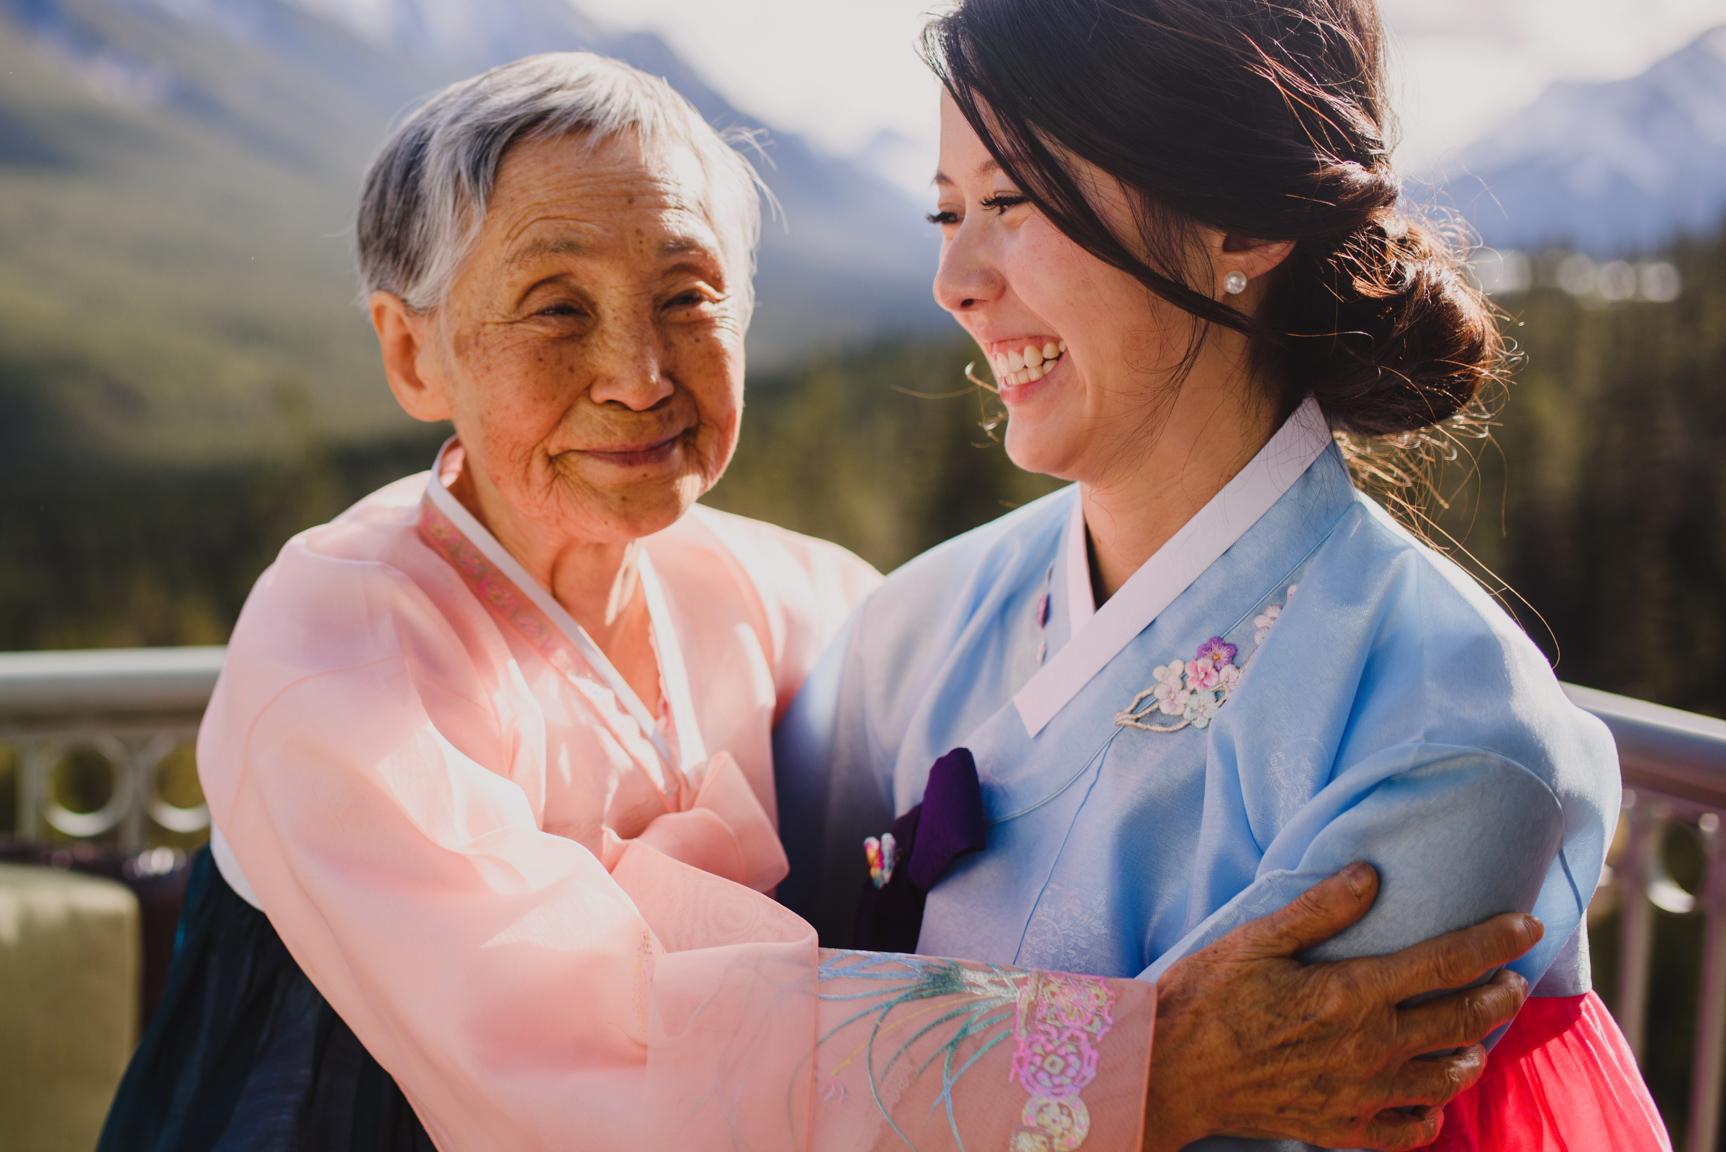 Banff-Wedding-Photography-MichaelChanPhotography10.JPG